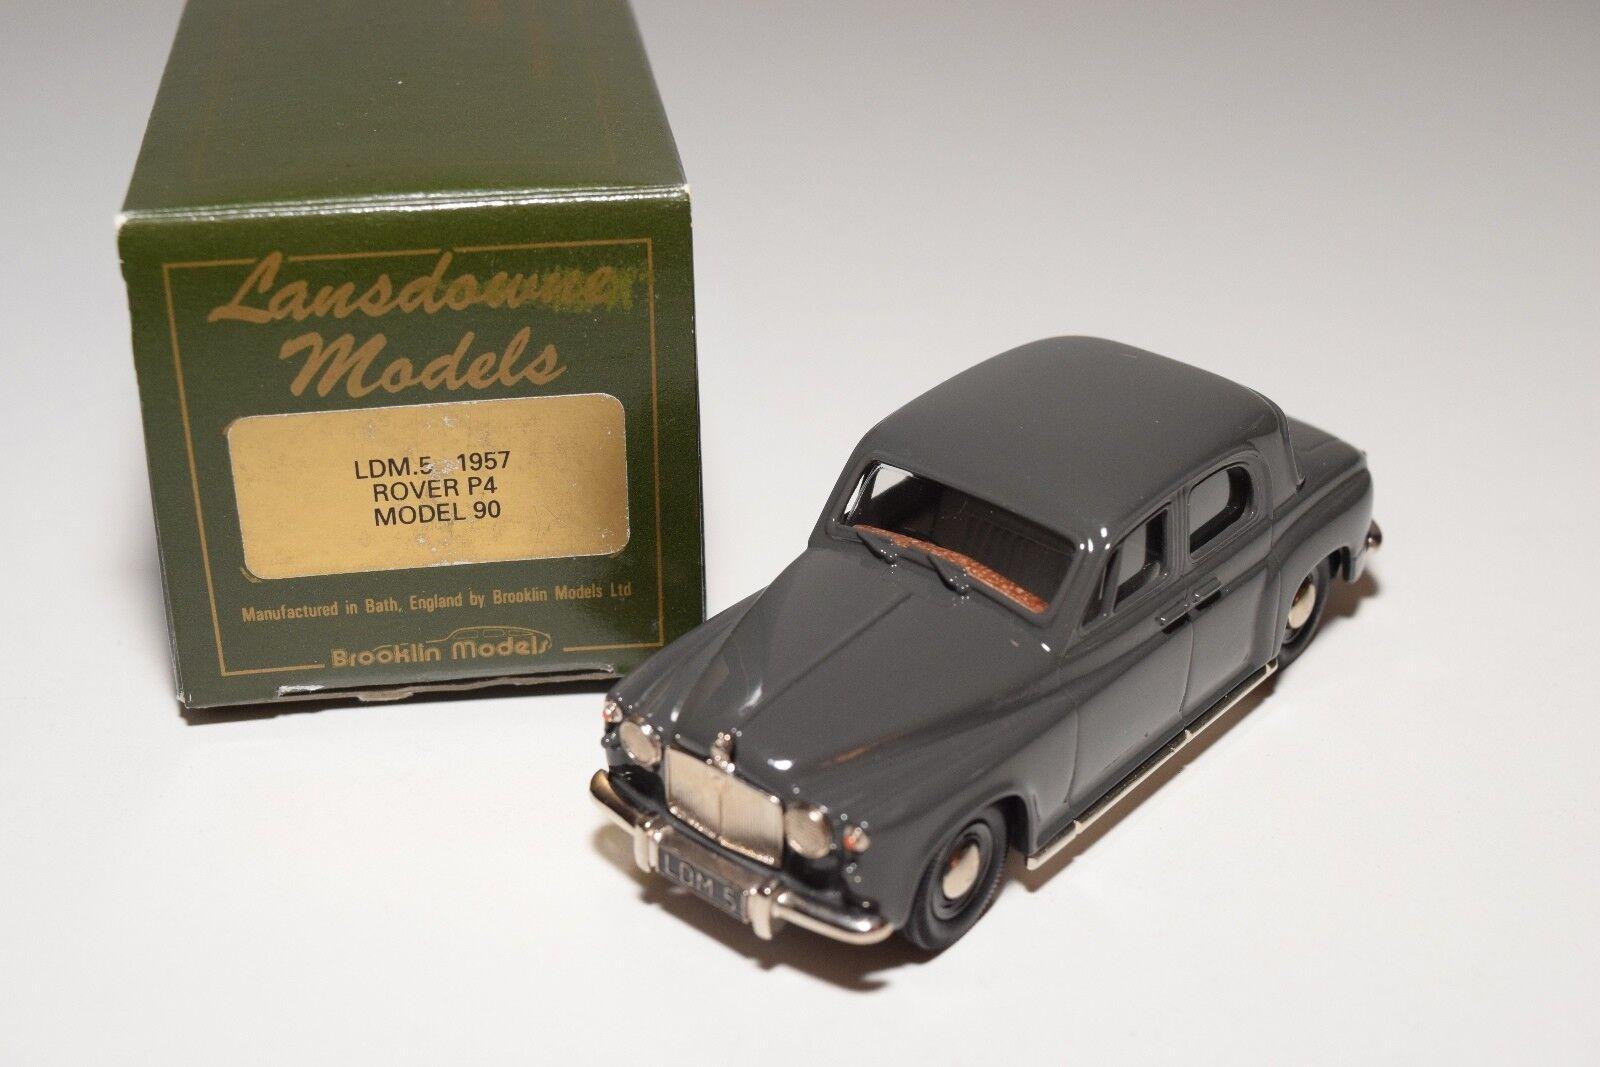 @ LANSDOWNE MODELS LDM 5 1957 ROVER P4 MODEL 90 grigio MINT BOXED